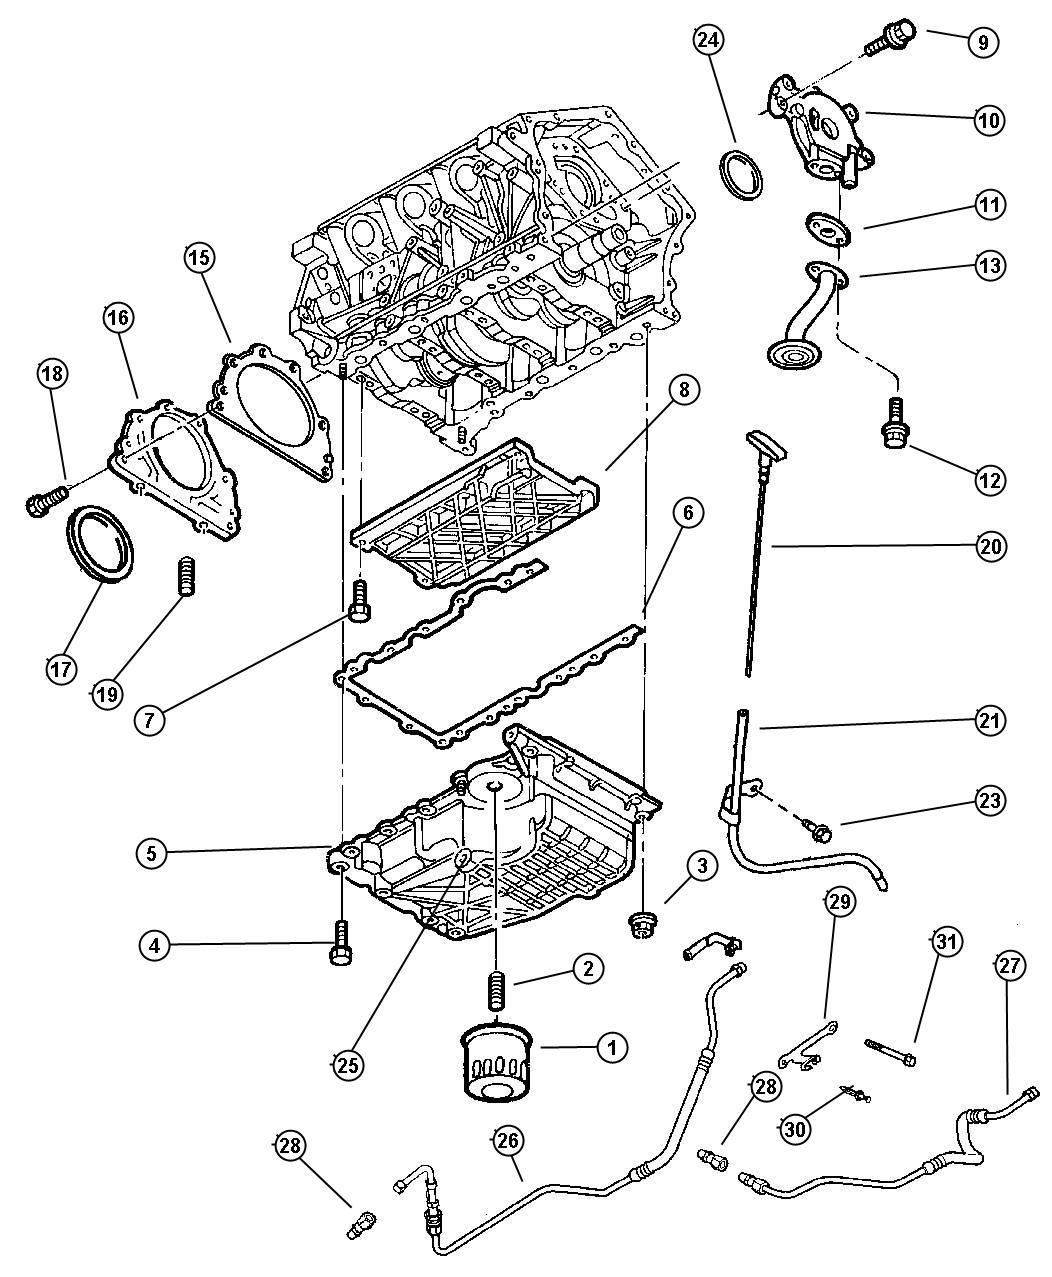 Chrysler Concorde Engine Oiling 2 7l Engine